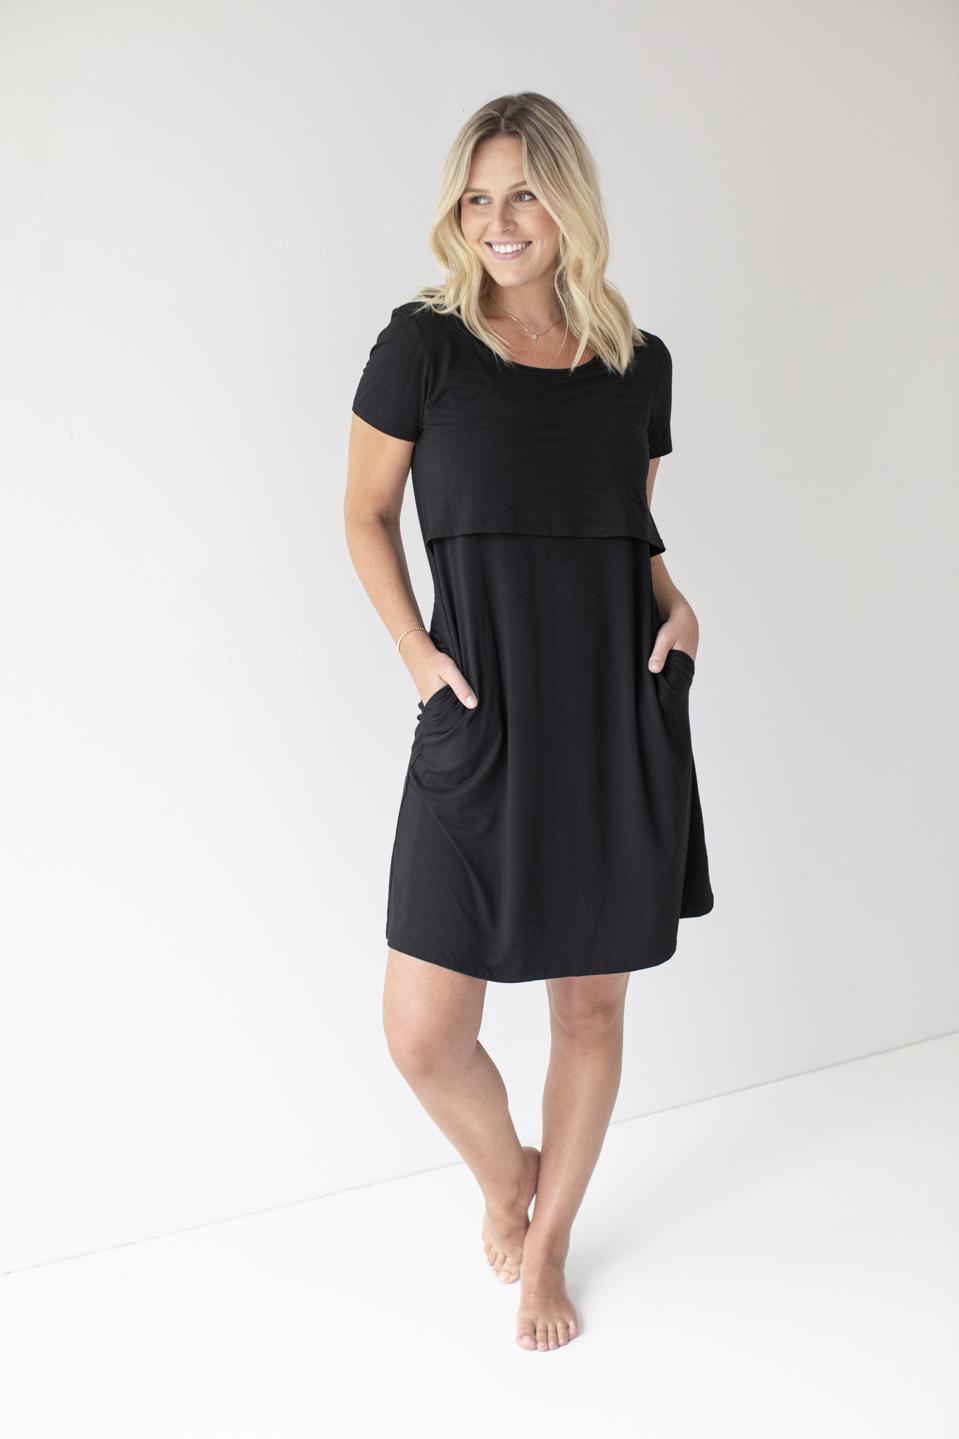 Kindred Bravely Eleanora Lounge Dress for new moms